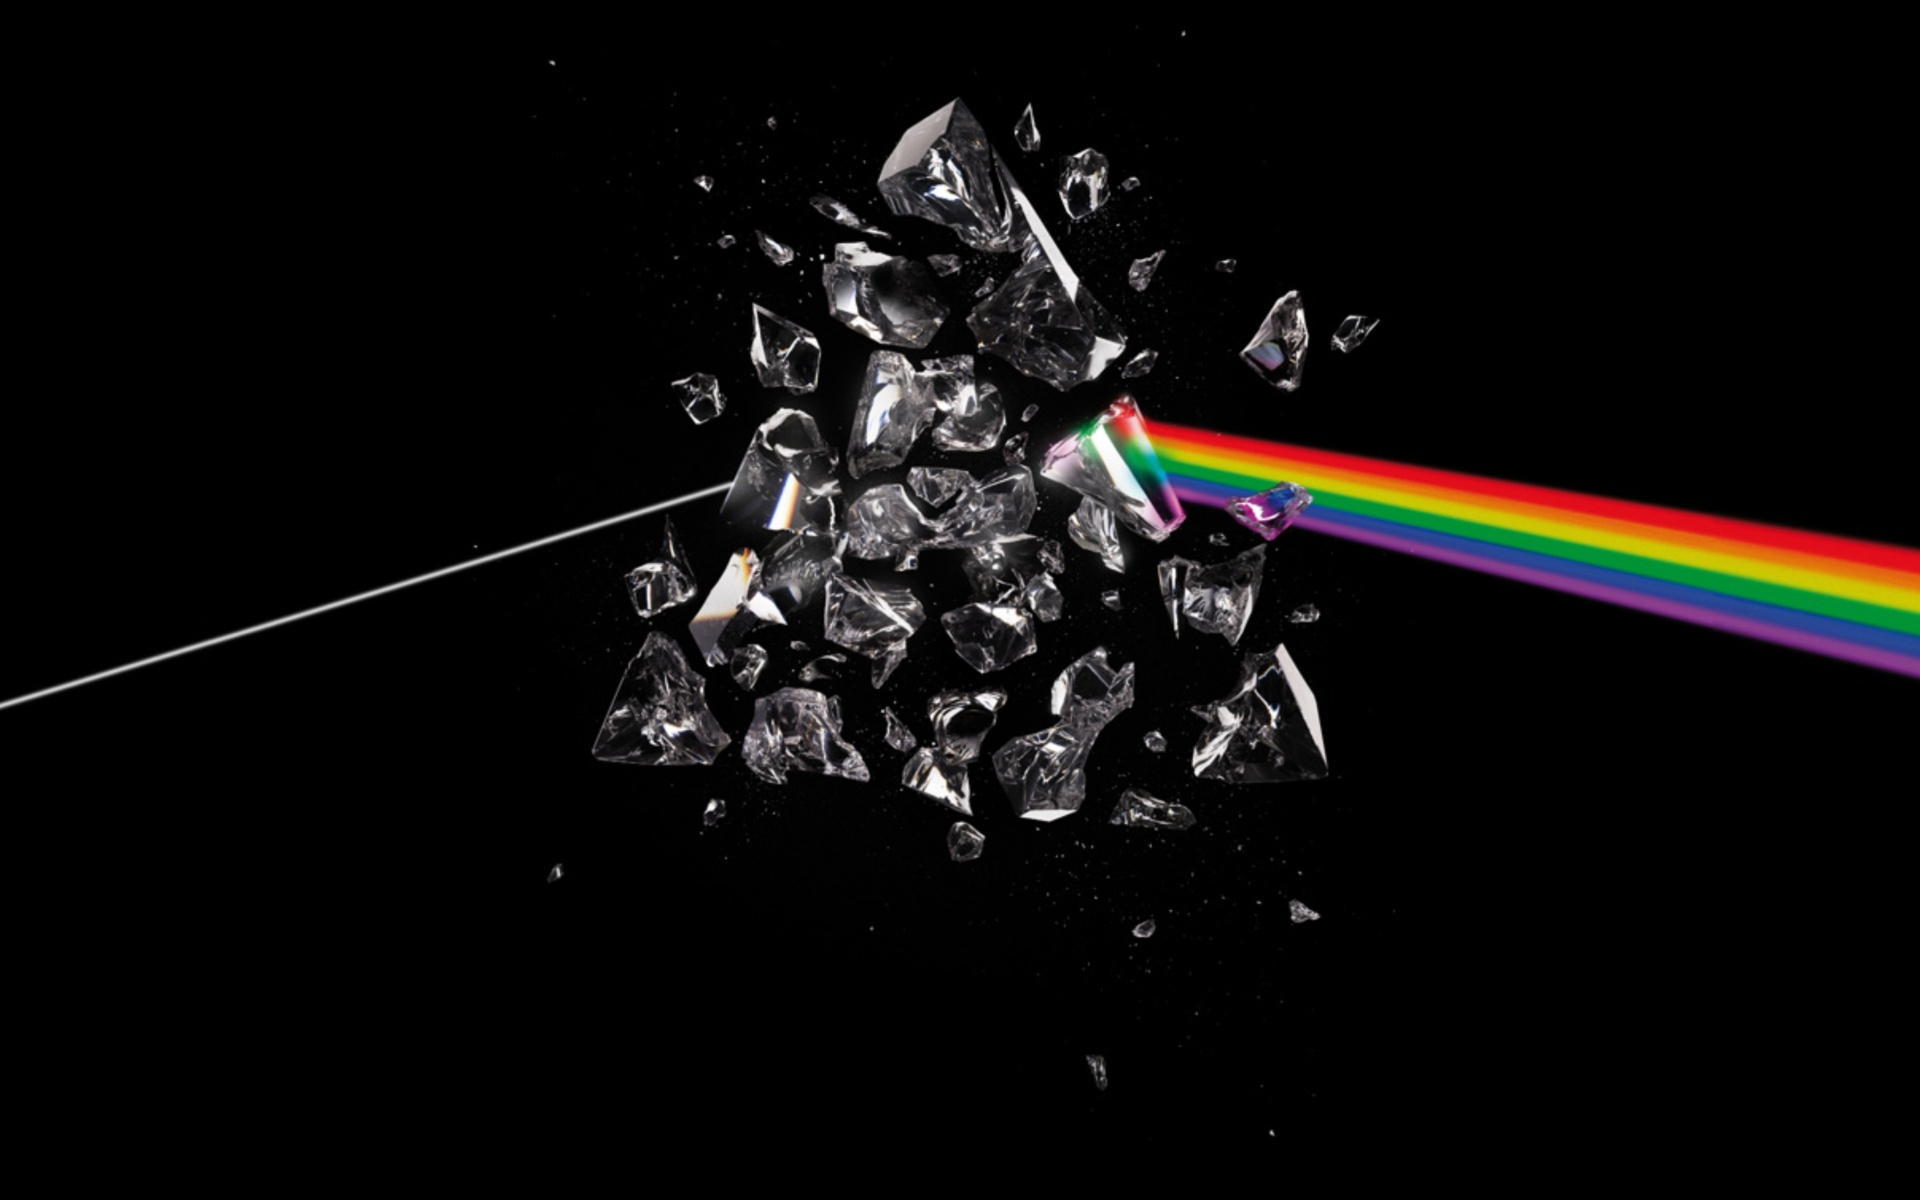 Pink Floyd Prism Rainbows Wallpaper 1920x1200 22918